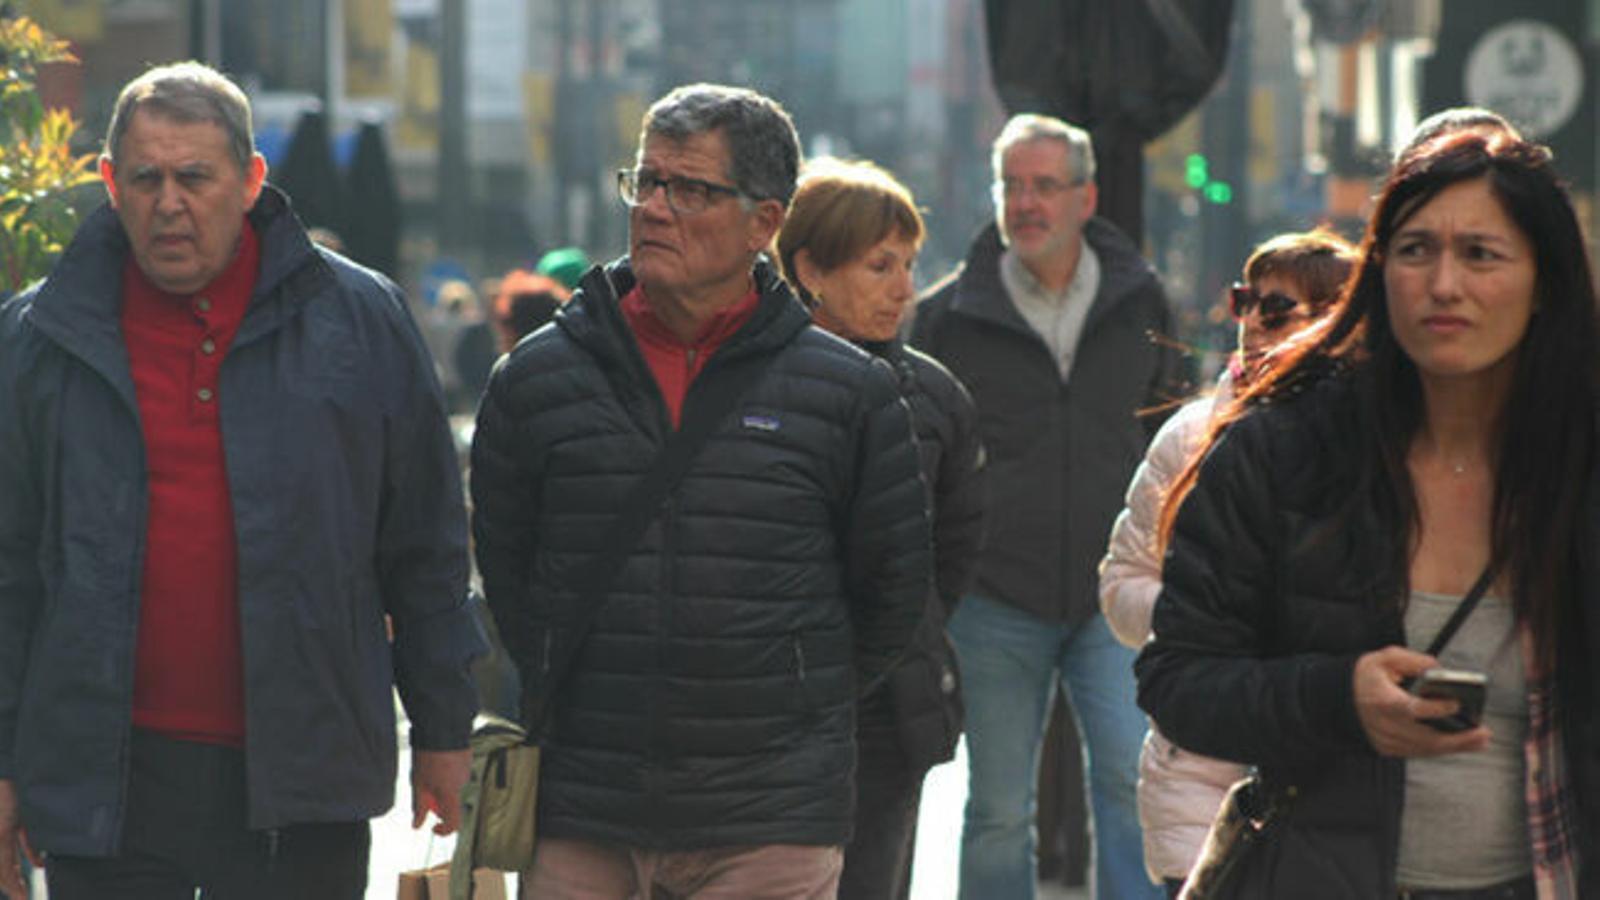 Gent caminant per l'avinguda Meritxell. / M. R. F. (ANA)